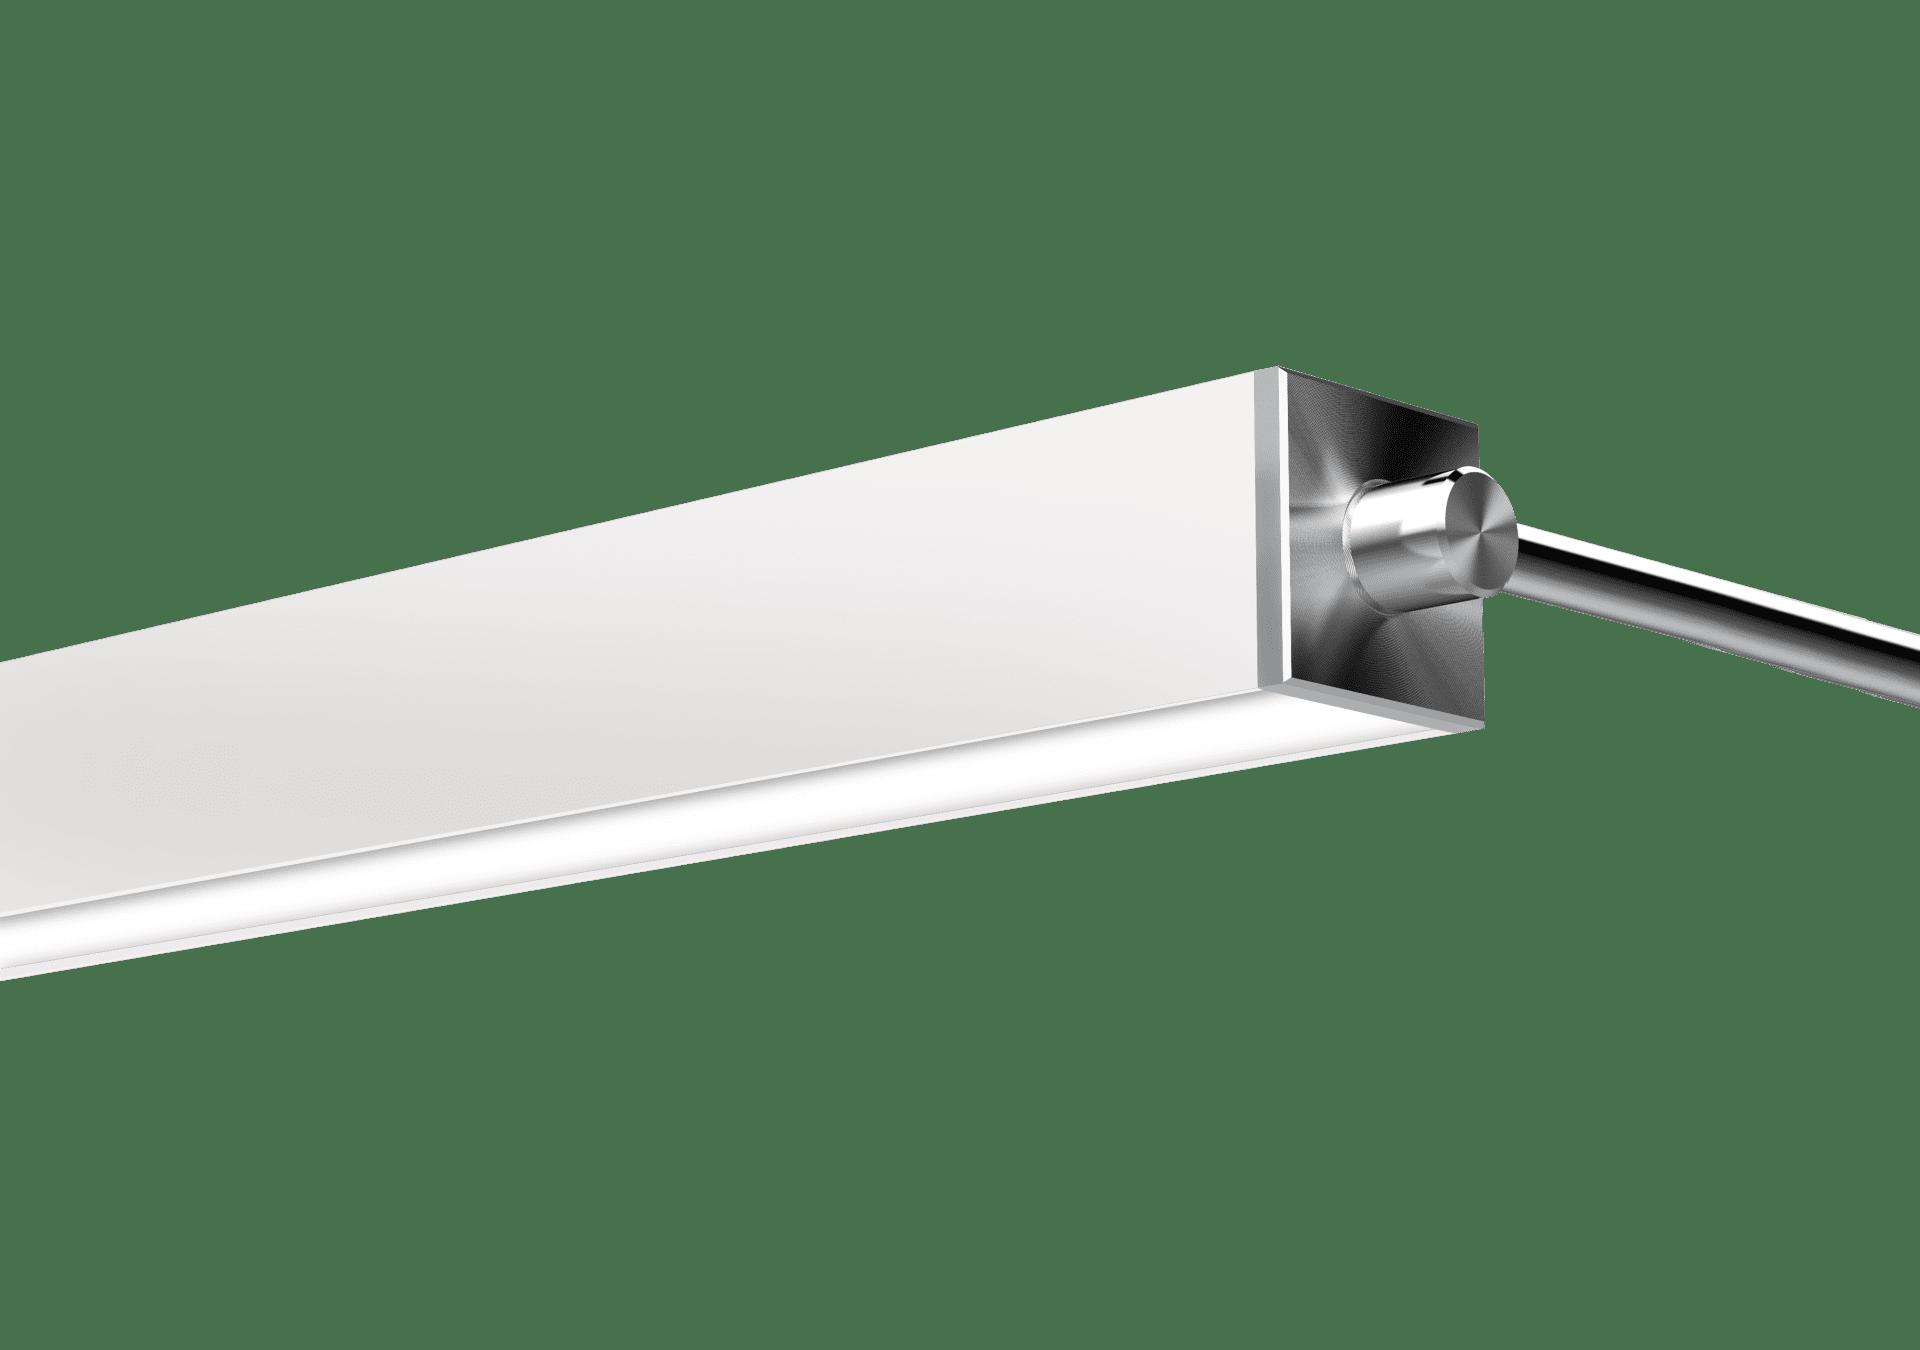 Nitrogen 3 White Rotational Arm Mount